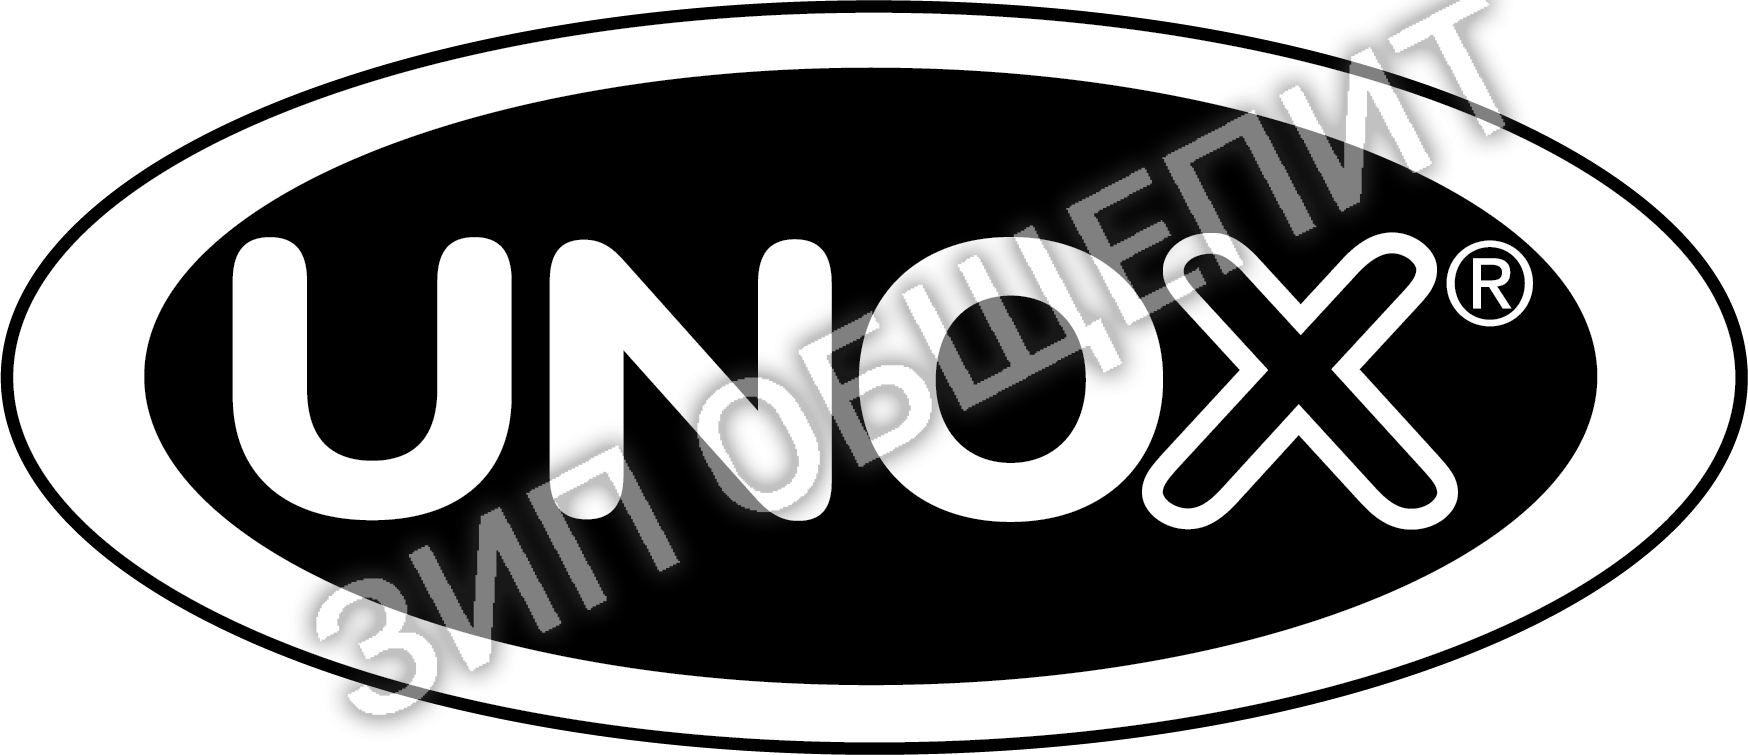 Втулка VM1986A0 для пароконвектомата UNOX модели XEVC-0511-E1R